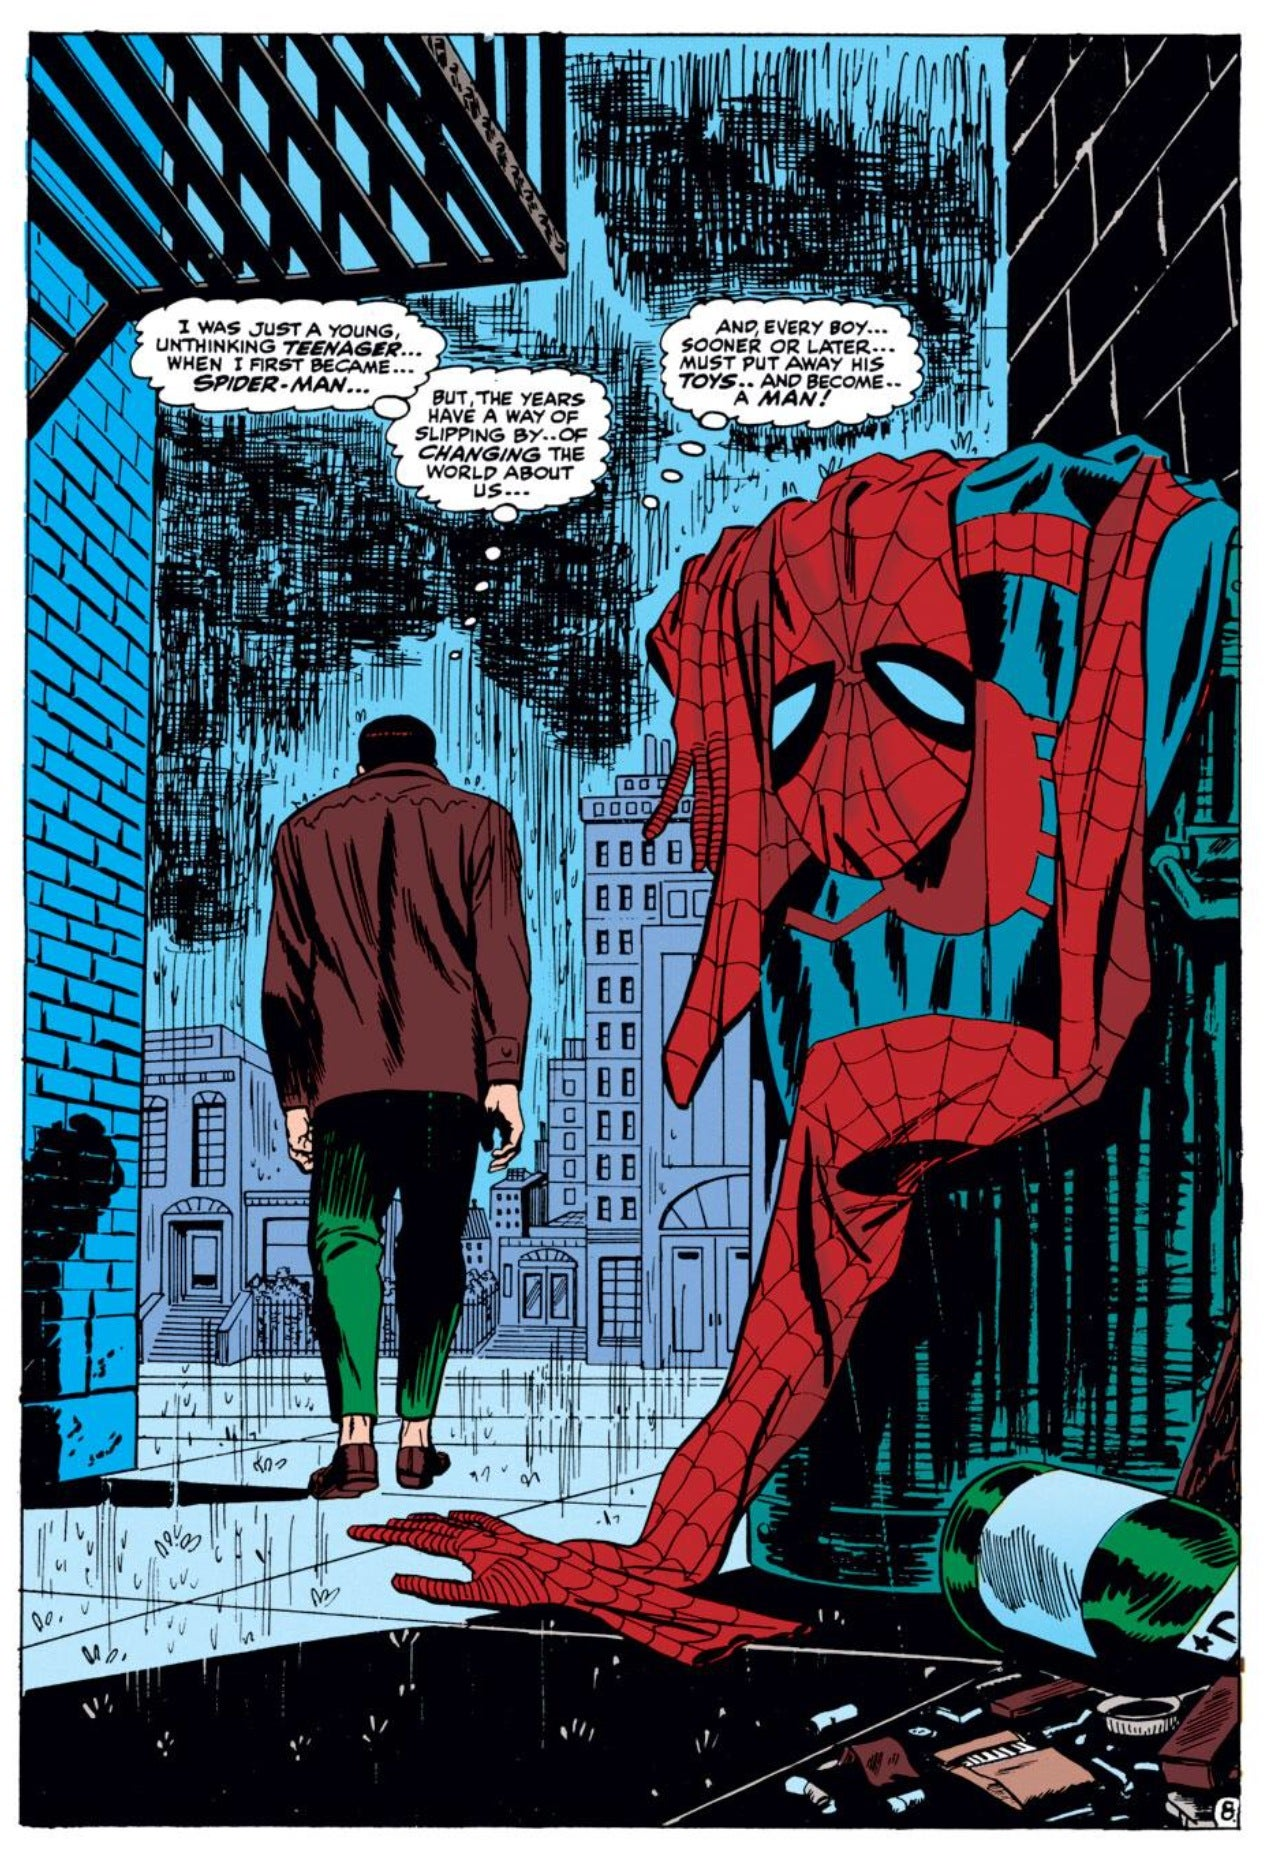 75 Most Iconic Marvel Comics Moments 30 16